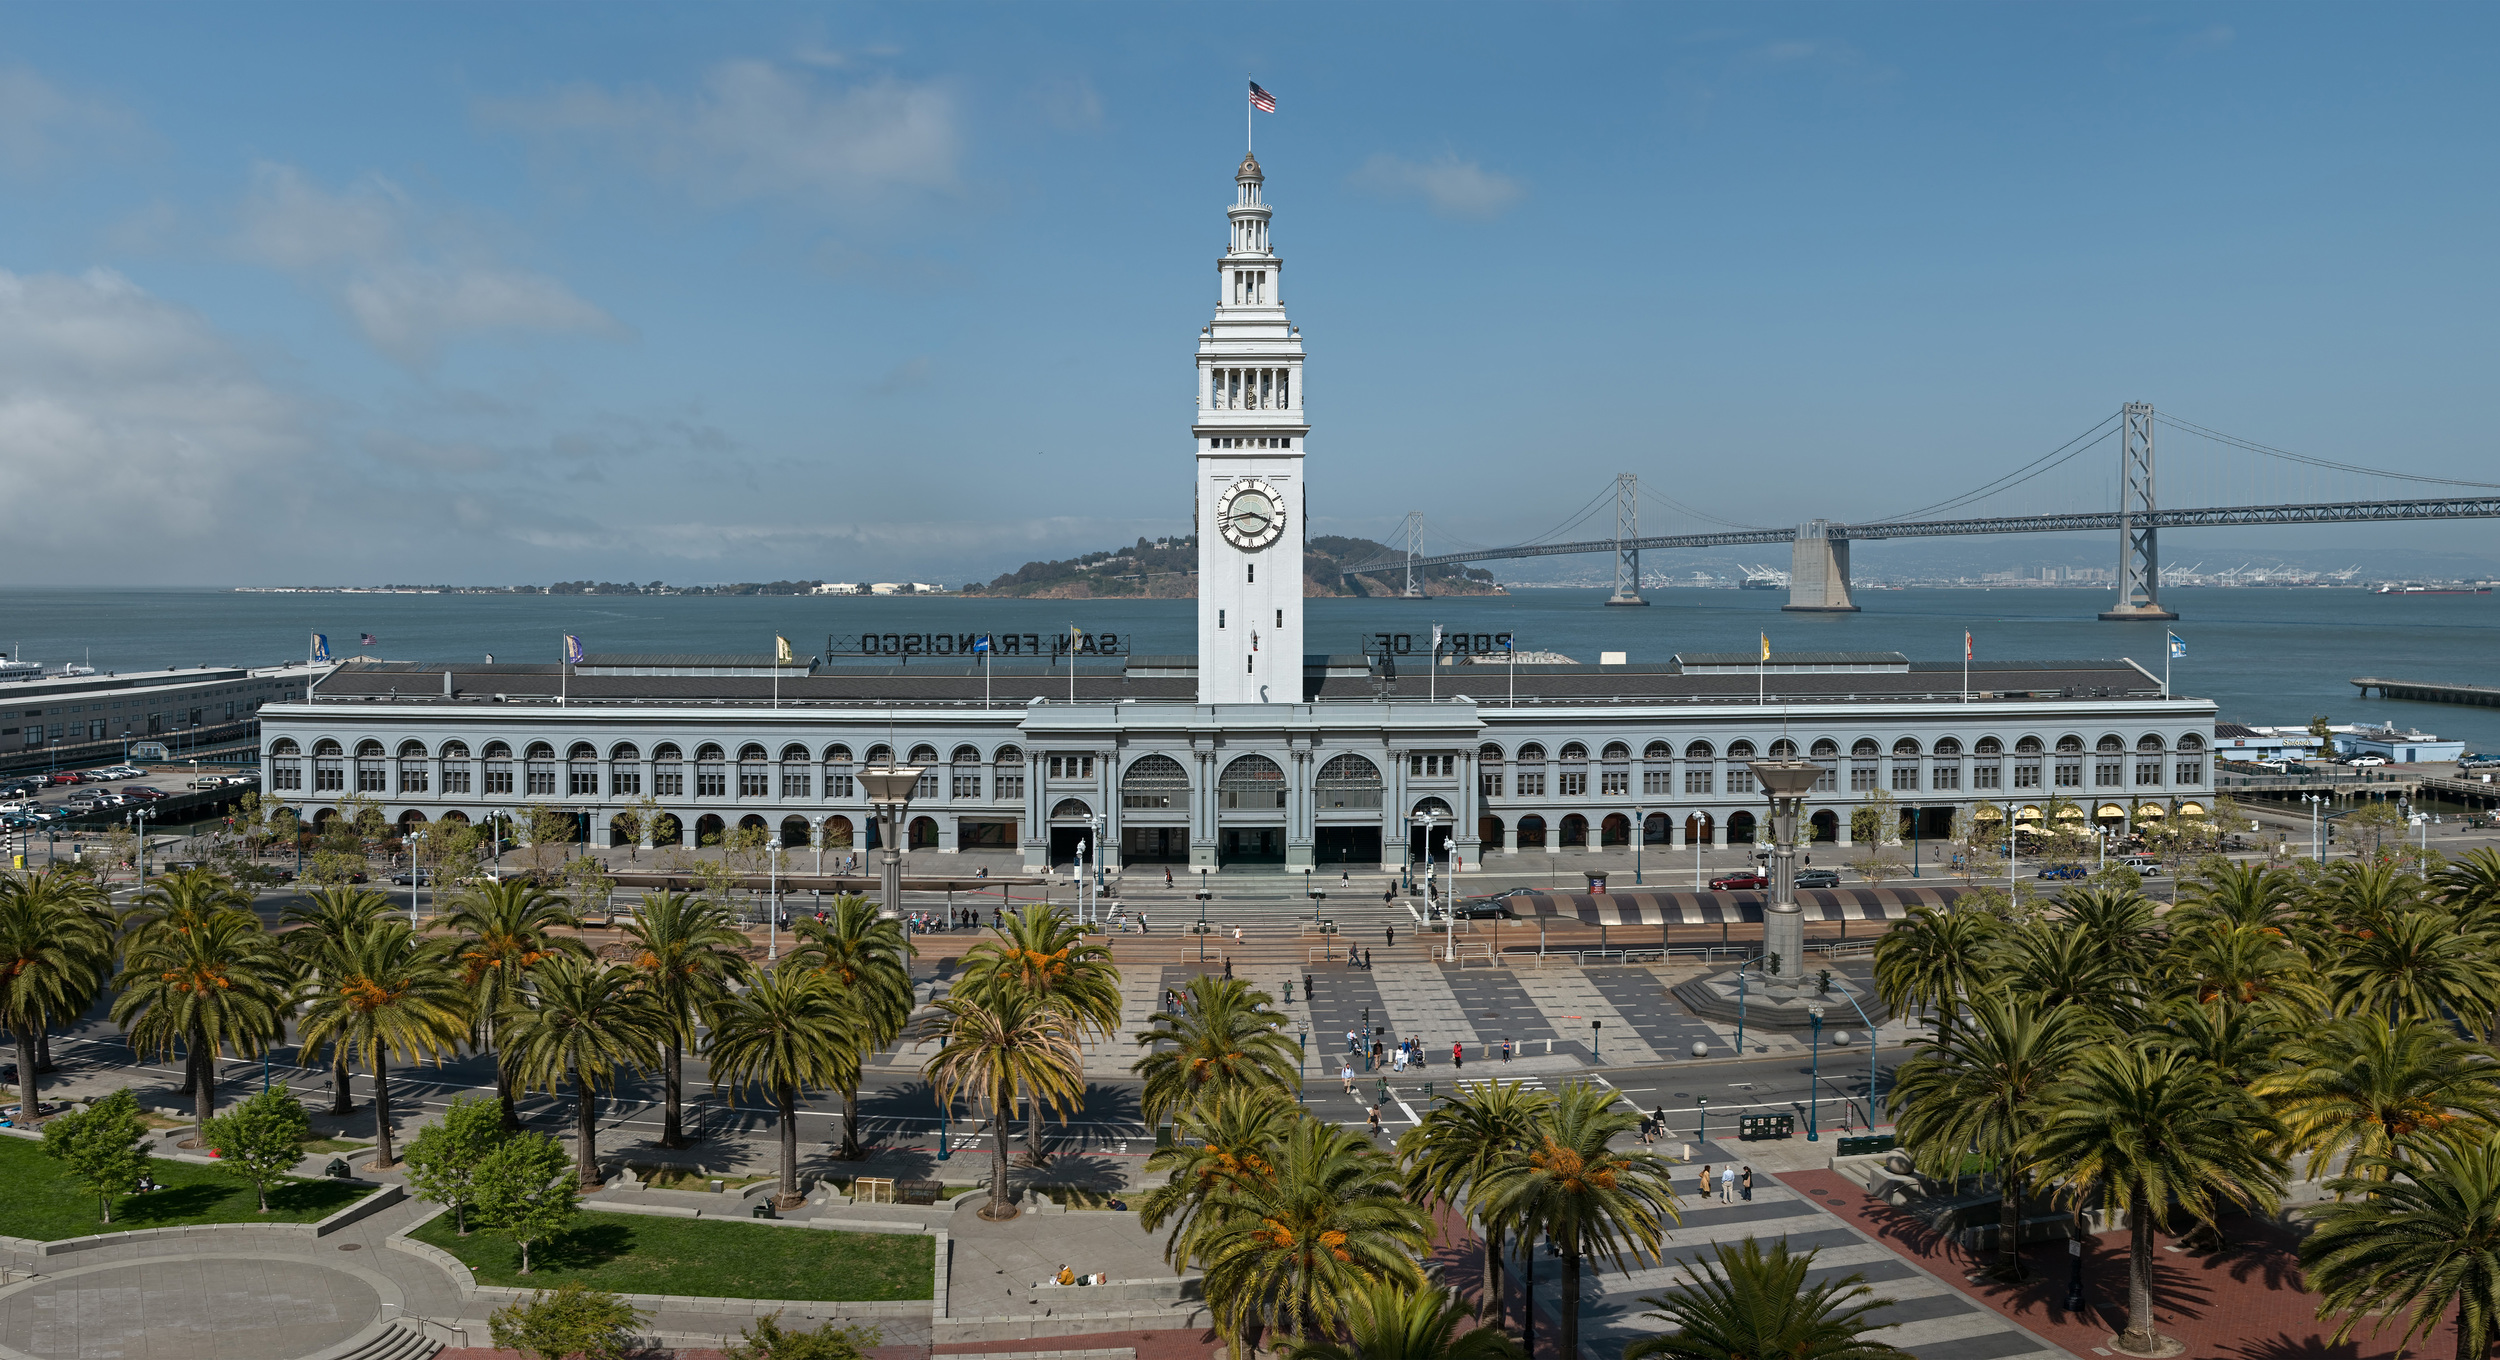 San_Francisco_Ferry_Building.jpg